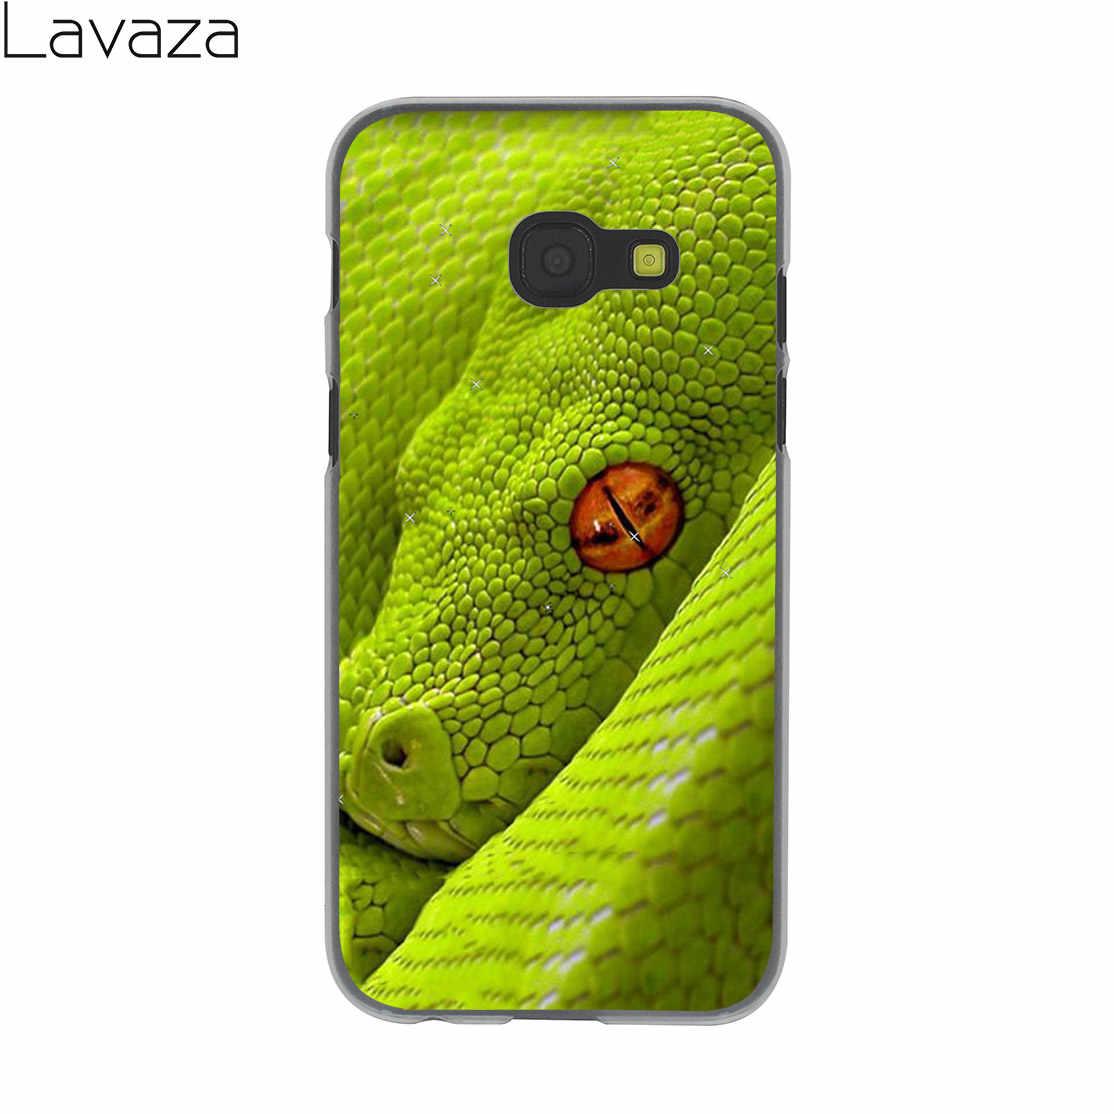 Lavaza кожаная обложка розового цвета со змеиным рисунком весы Kiu зеленый чехол для Samsung Galaxy Note 10 9 8 A9 A8 A7 A6 плюс 2018 A5 A3 2015 2016 2017 A2